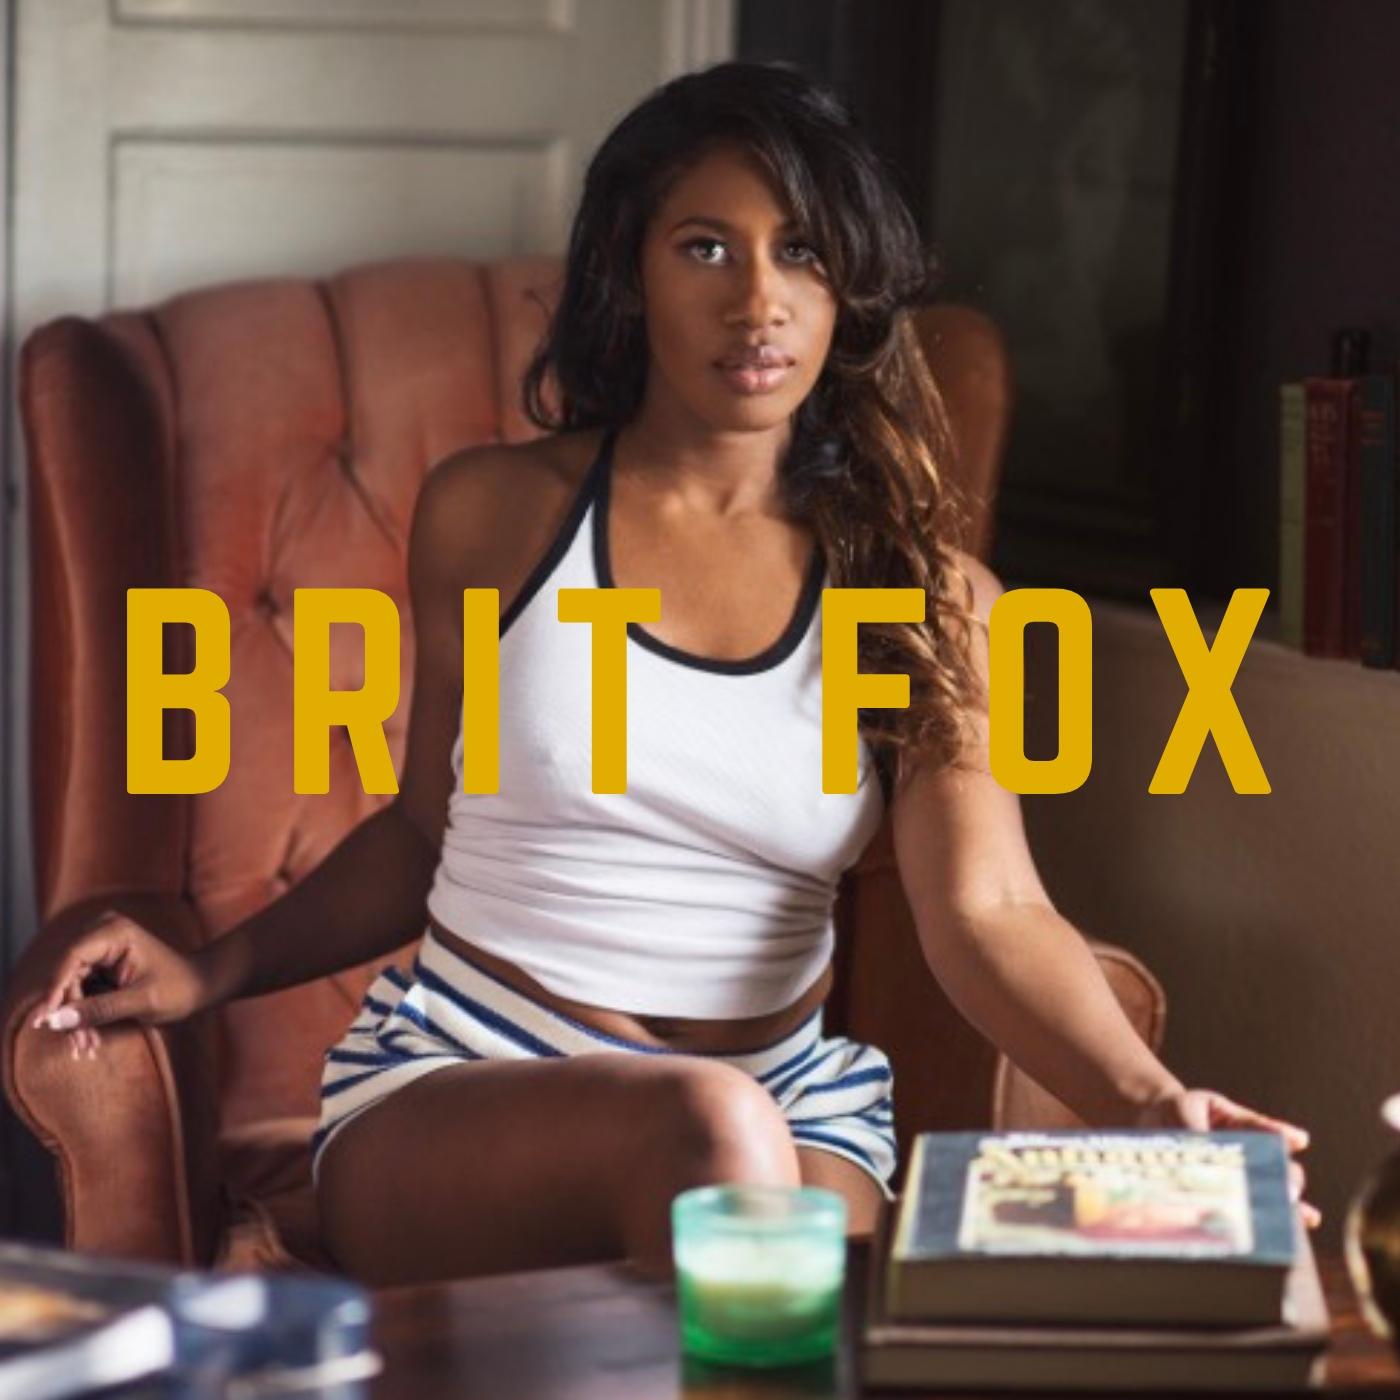 Brit Fox aka xfoxrox Recording Studios Mixing, Mastering and post production.